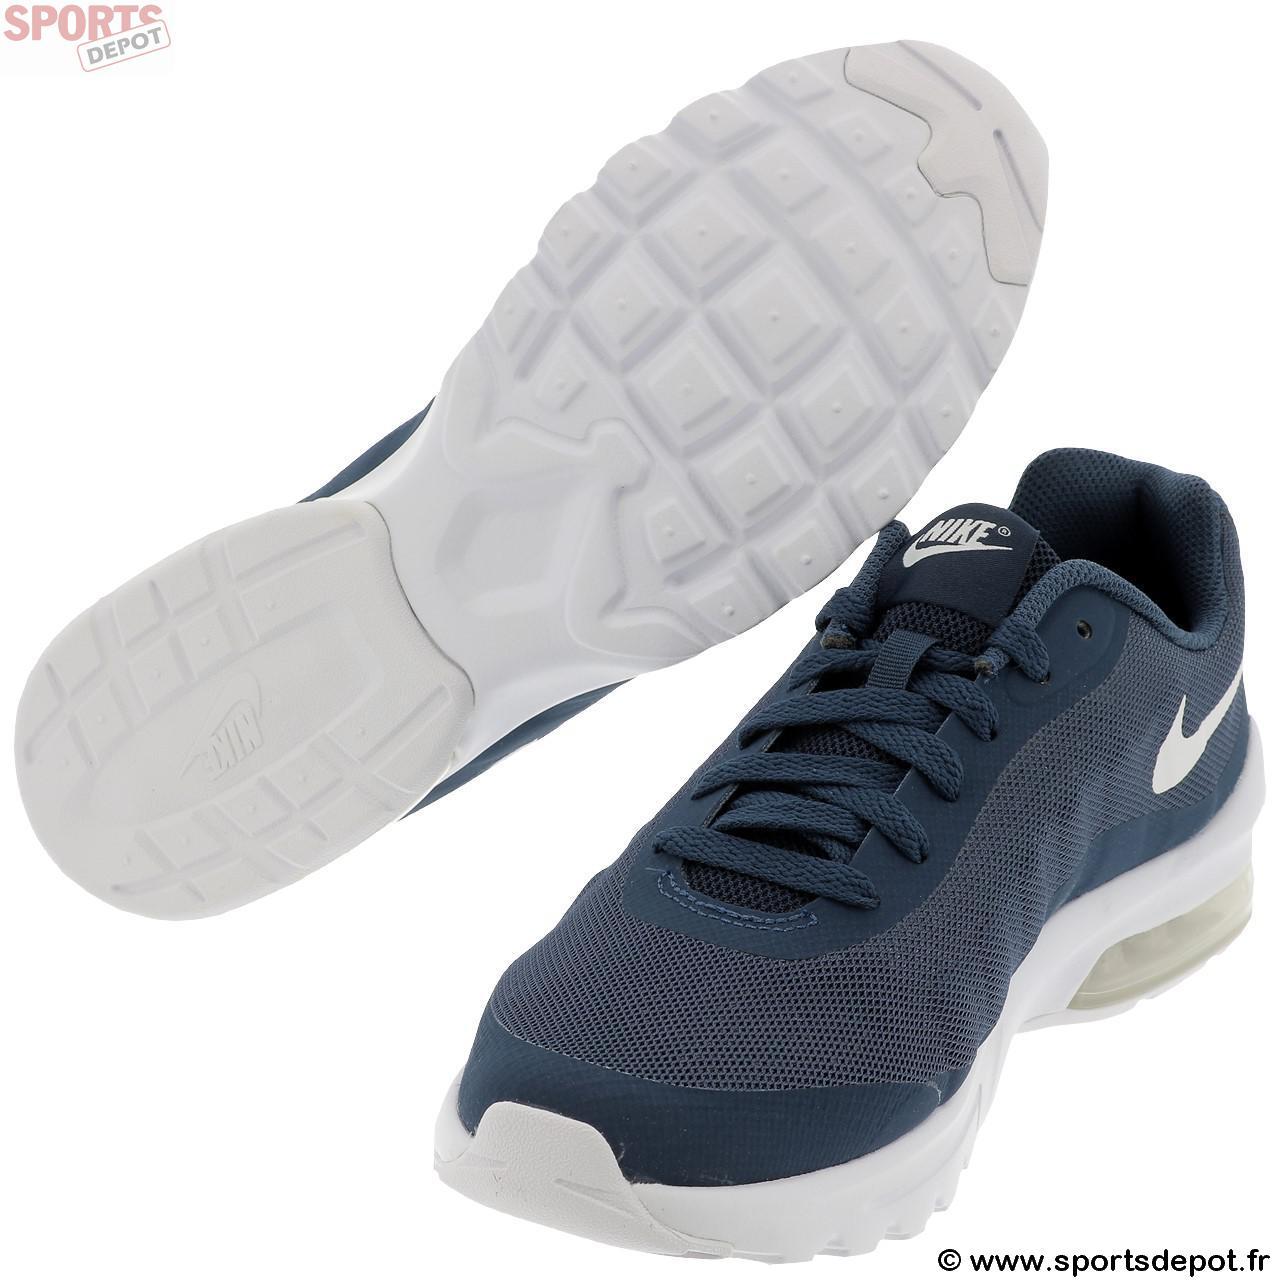 8bbbc82d849f5 Acheter Chaussures multisport NIKE Air max invigor bleu jr - Enfant ...